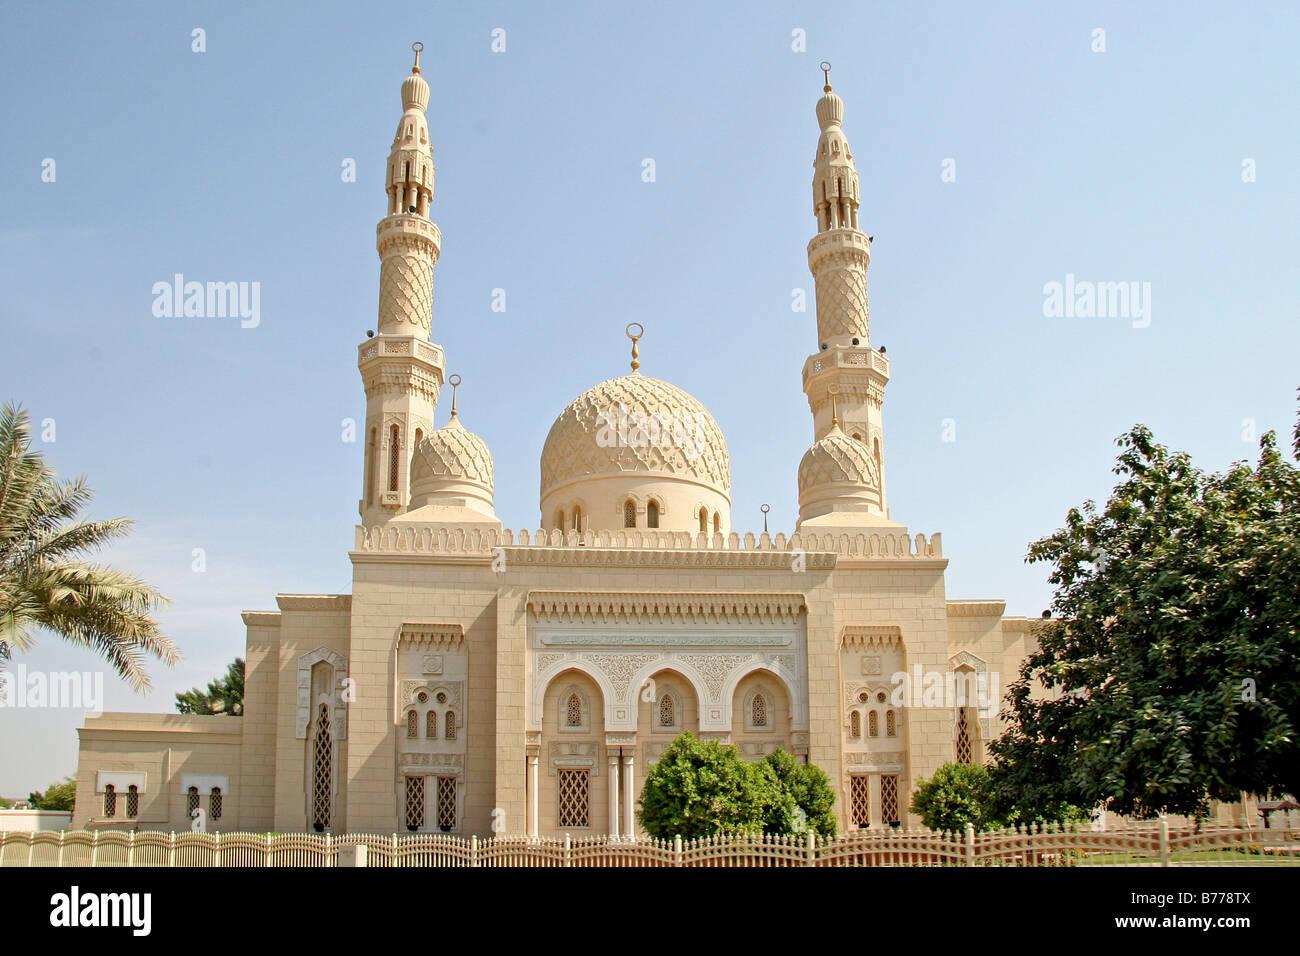 Jumeirah Mosque Dubai United Arab Emirates Middle East